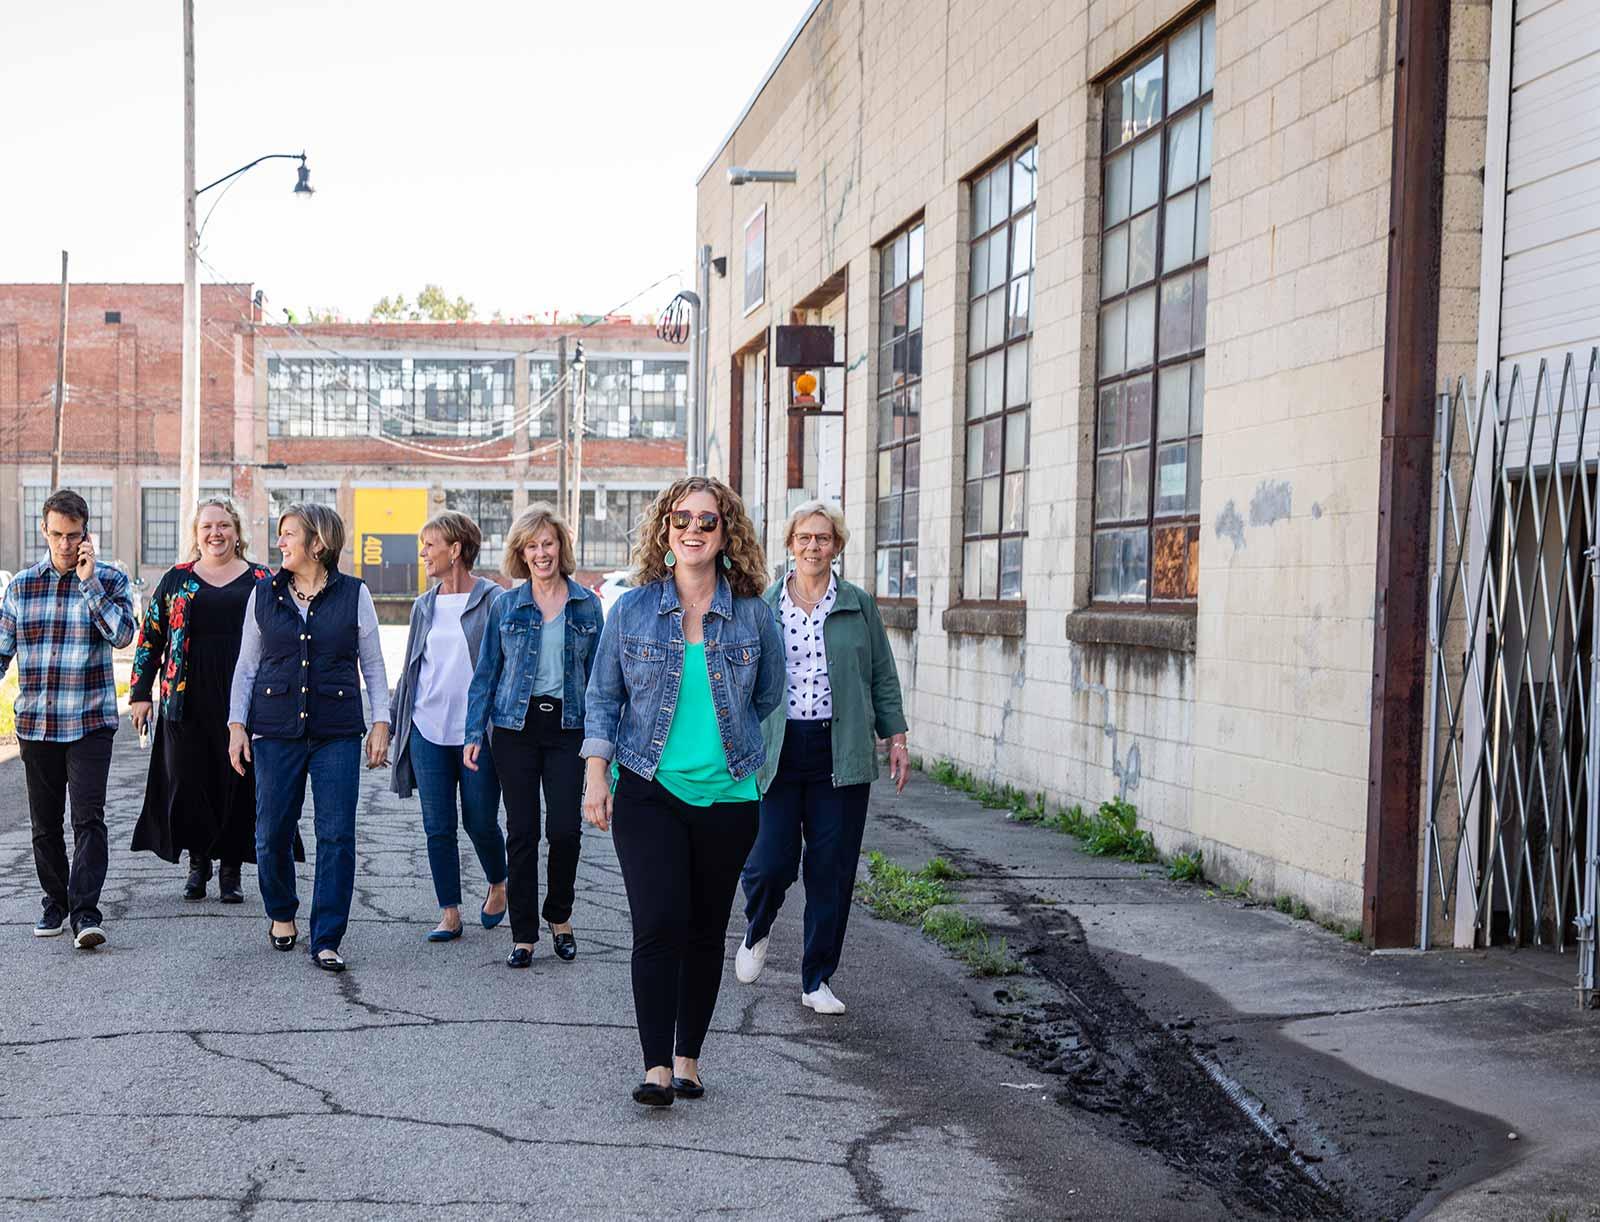 The Columbus Team walking down a Columbus street